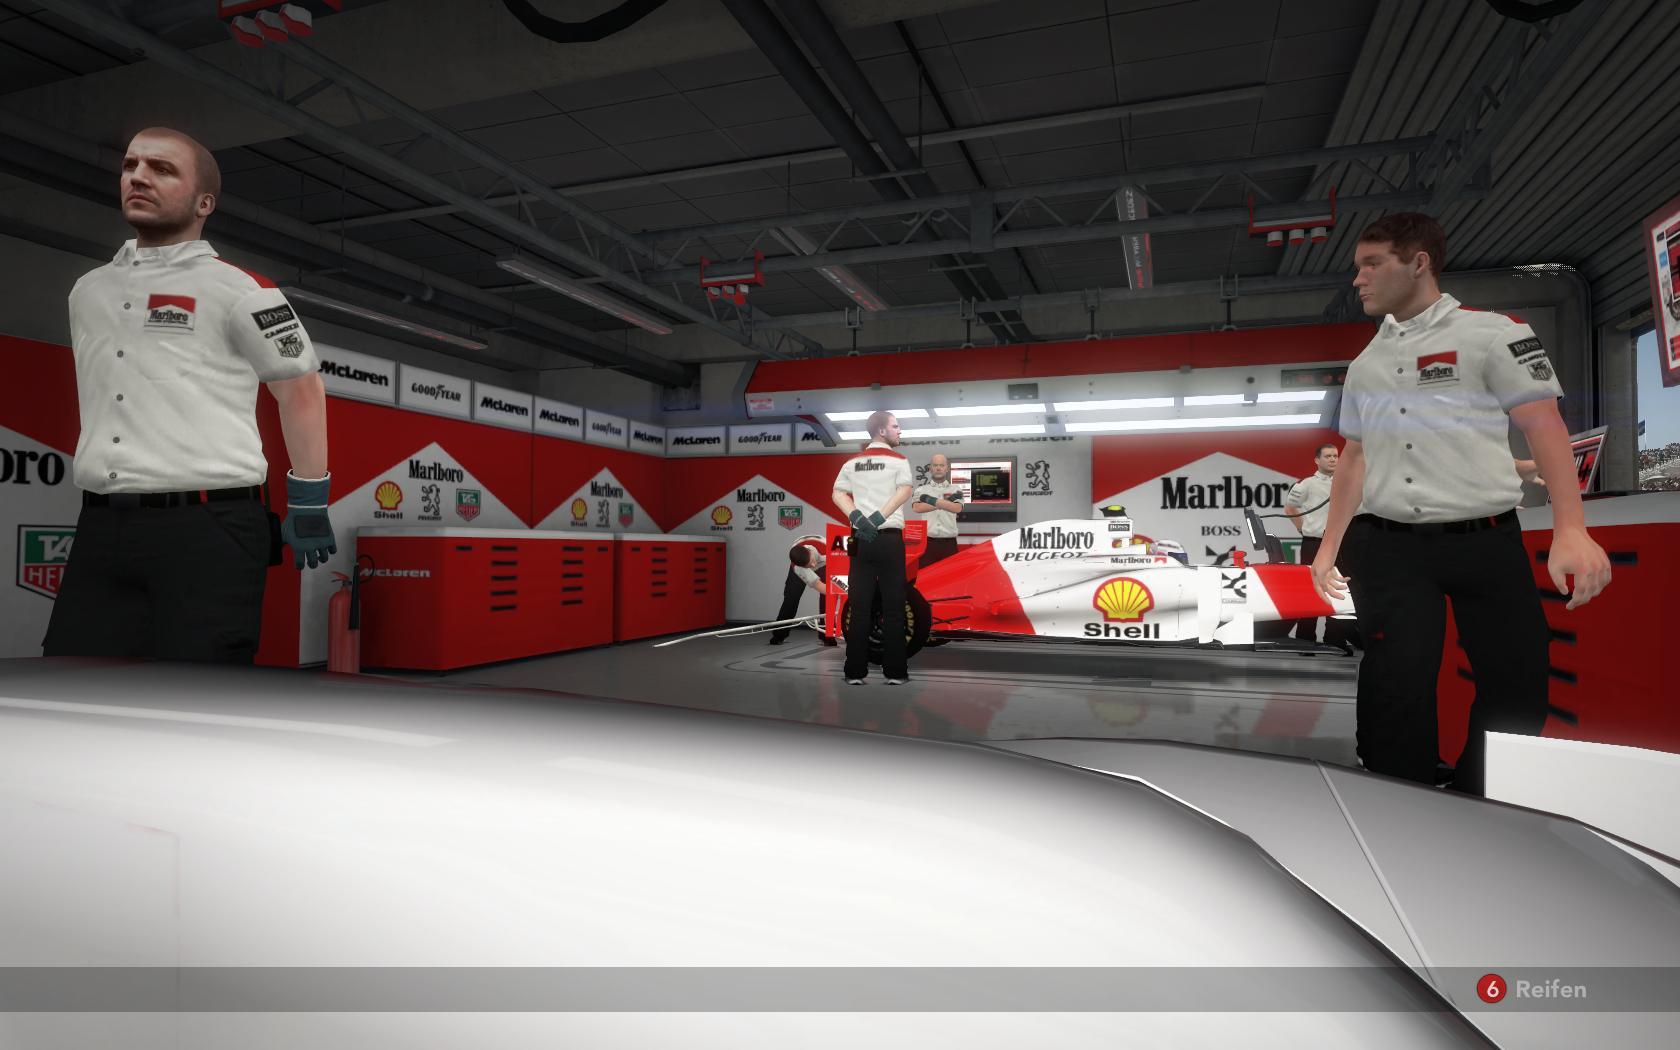 1994-Mclaren-garage.jpg